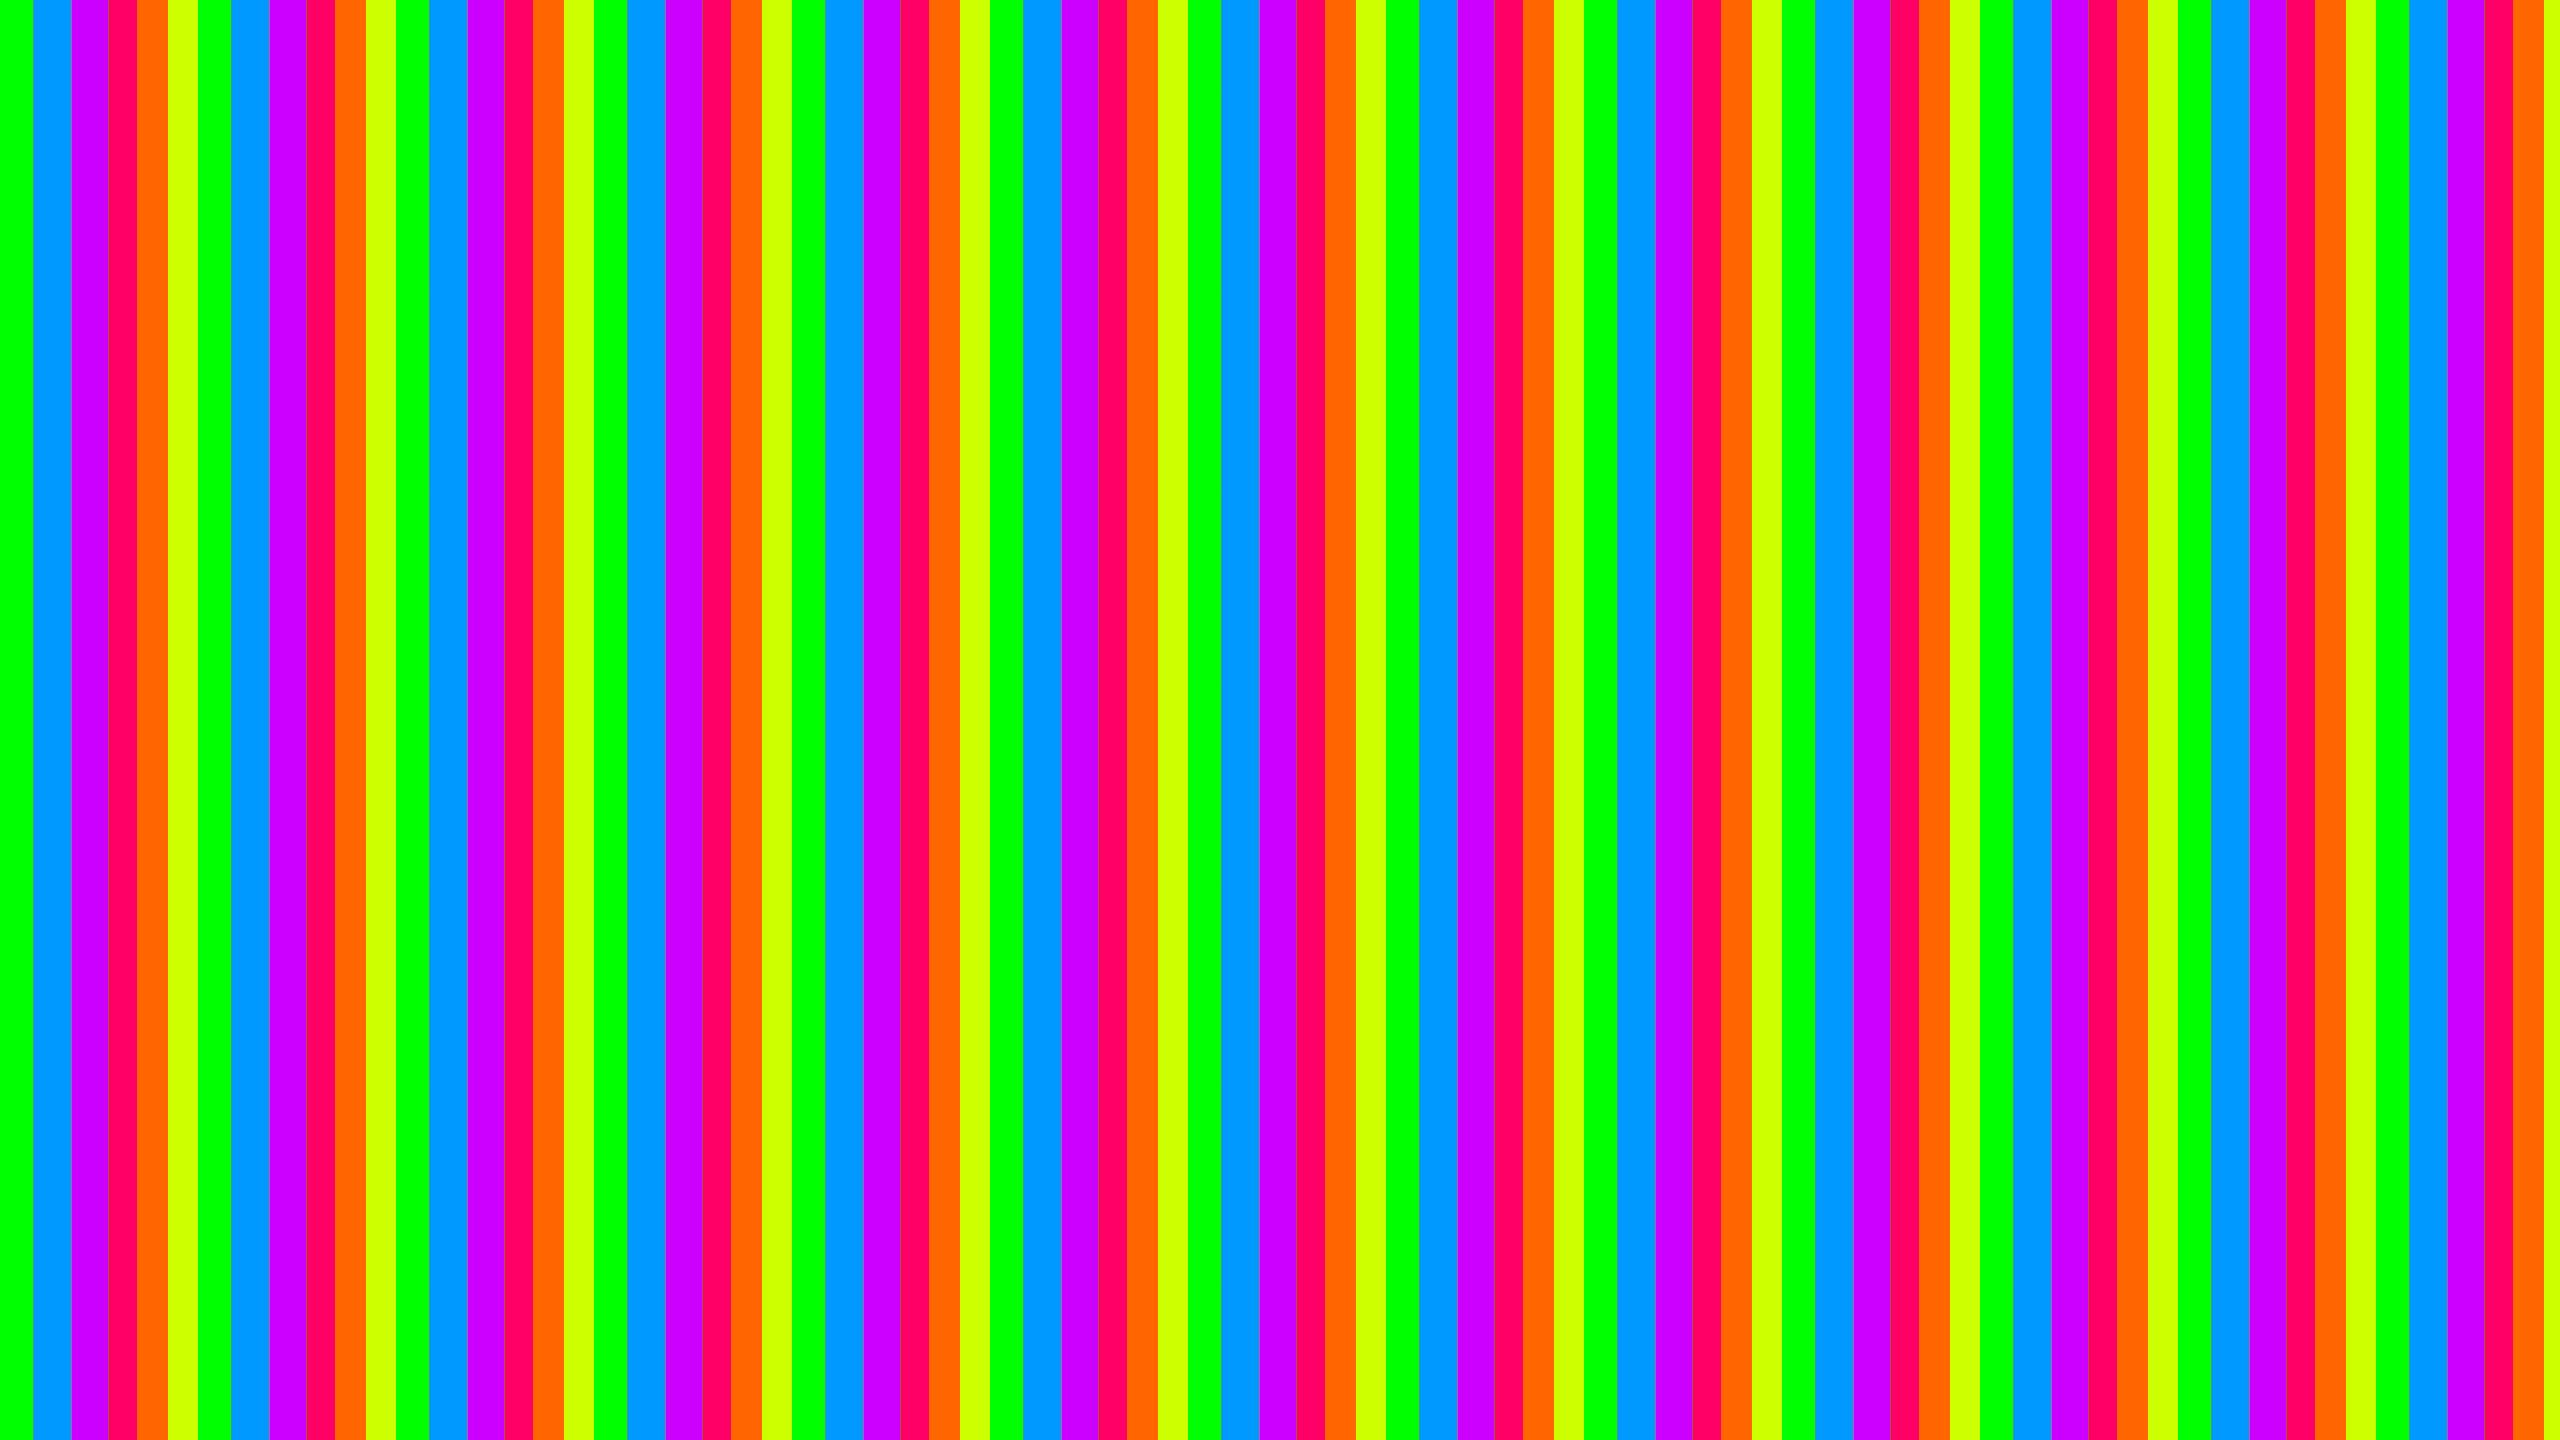 Flashing Lights Desktop Wallpaper is easy Just save the wallpaper 2560x1440